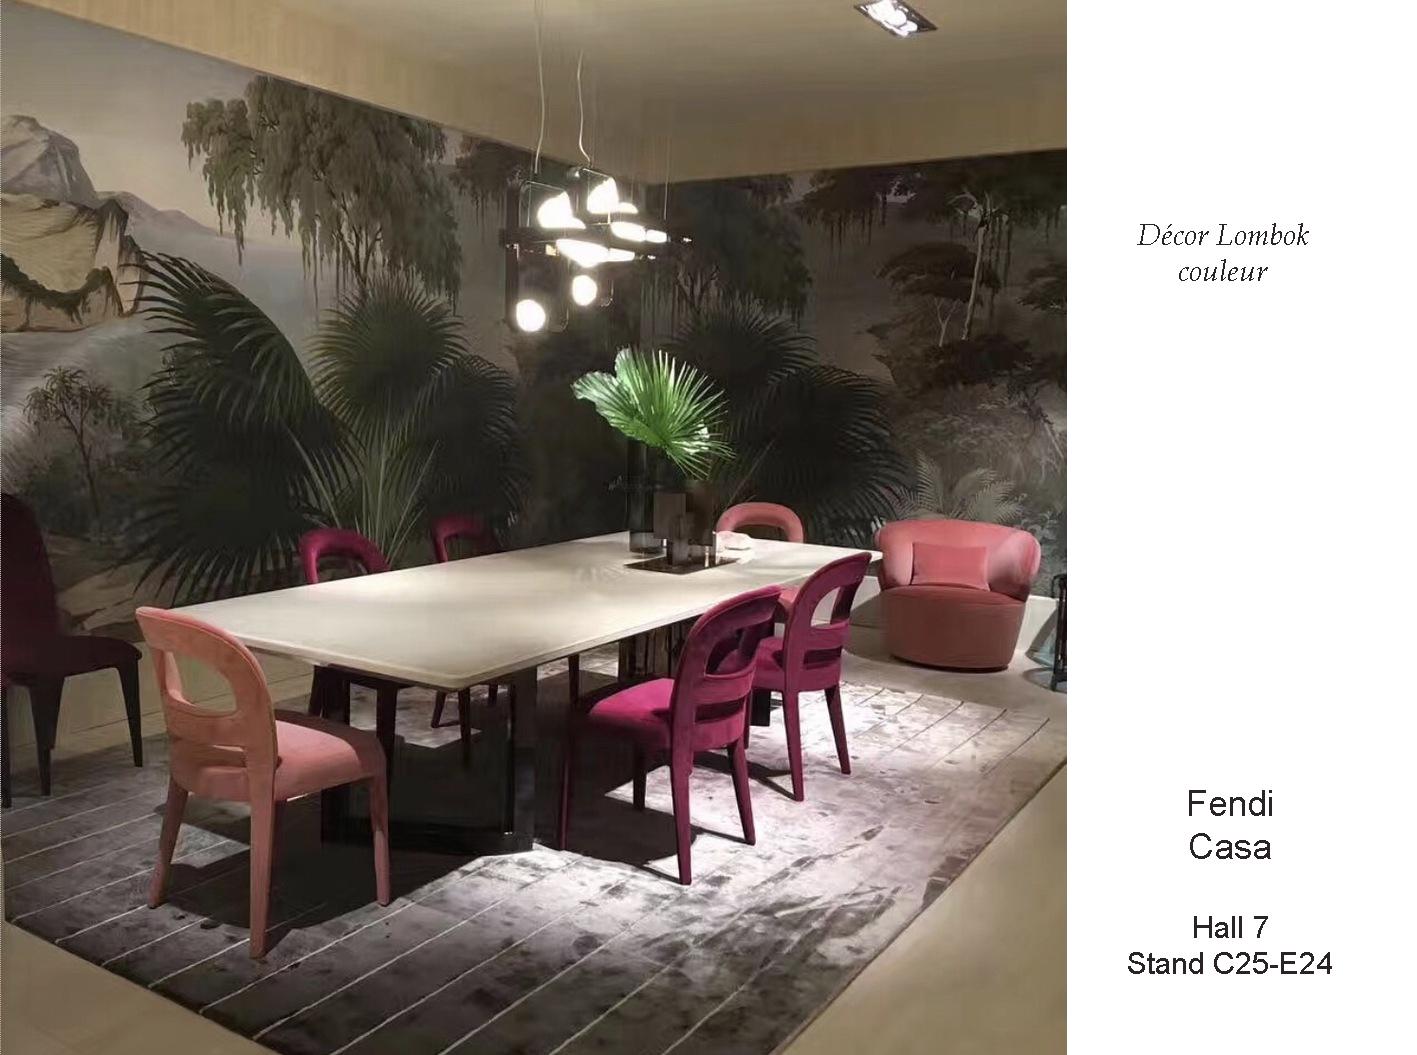 Ananb - Salon du meuble milan ...